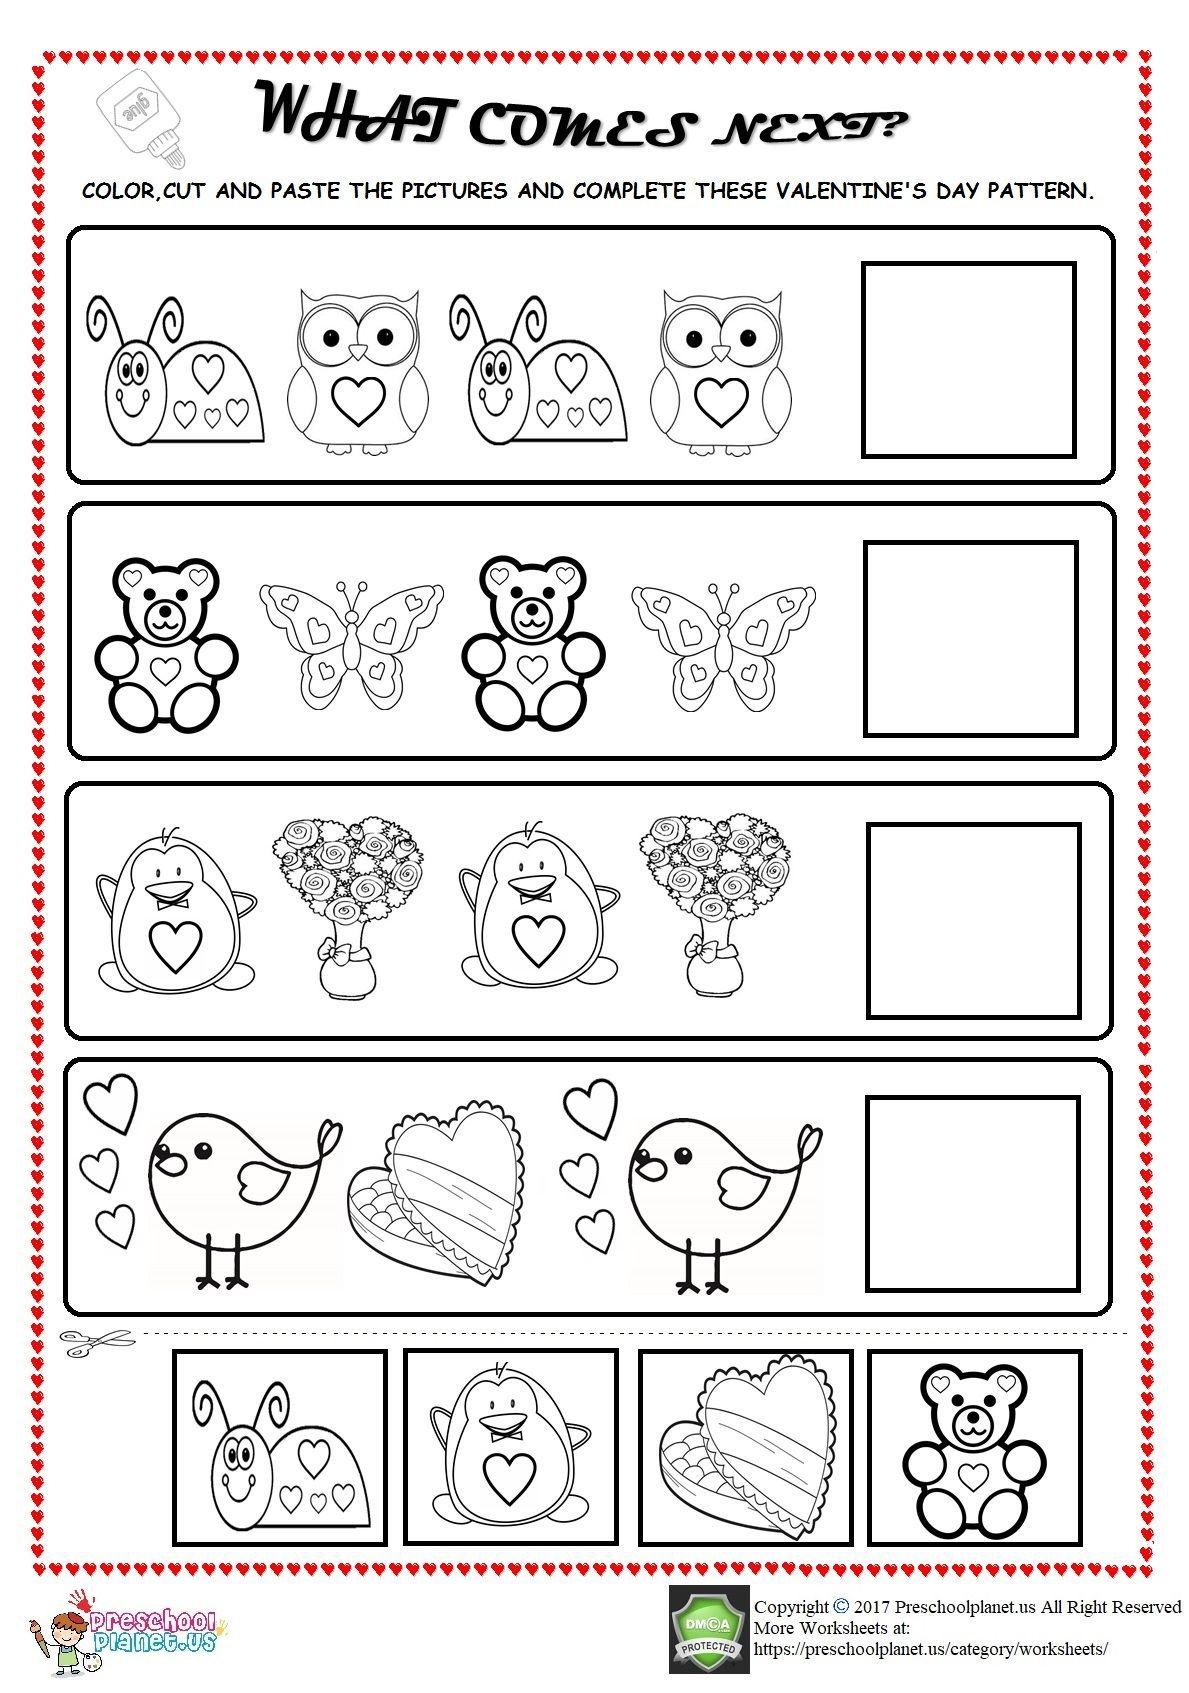 Valentine S Day Pattern Worksheet For Kids In